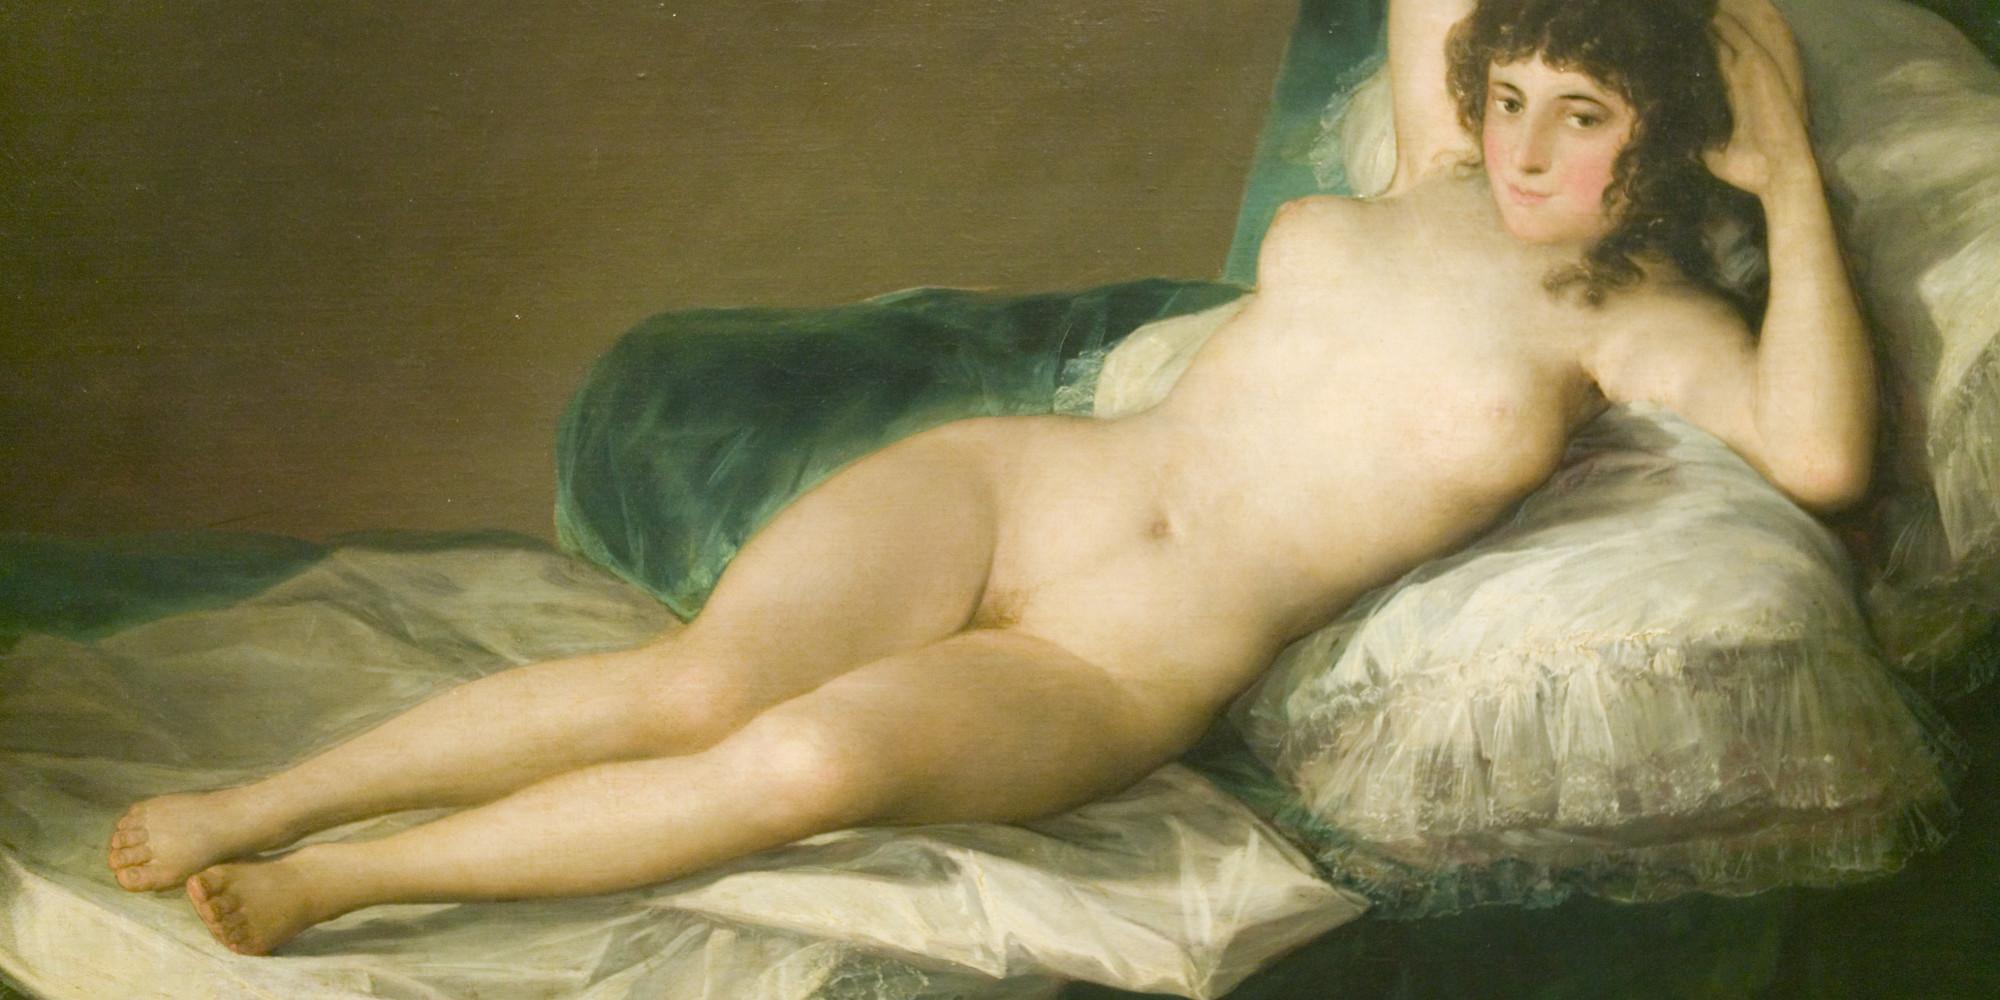 Rakhi sawant full nude image-3733